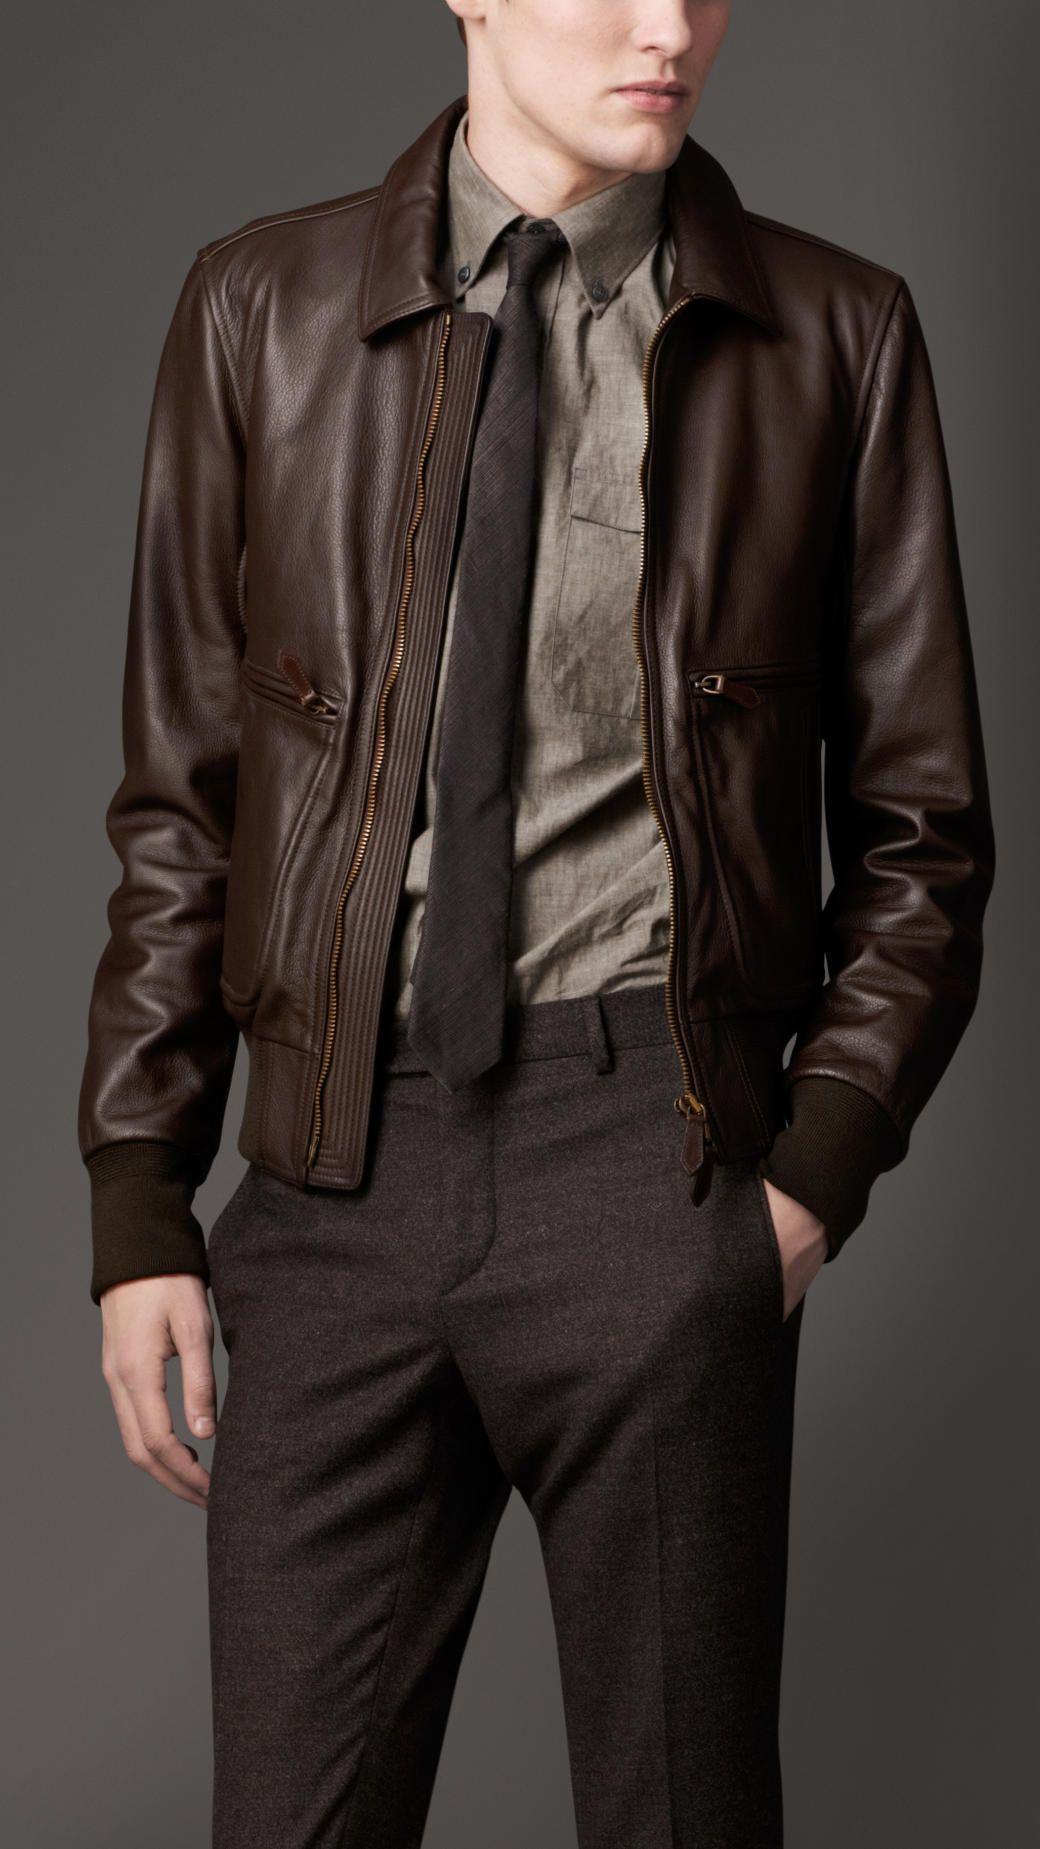 Men S Designer Outerwear Burberry Official Jackets Men Fashion Leather Jacket Outfit Men Leather Jacket [ 1849 x 1040 Pixel ]